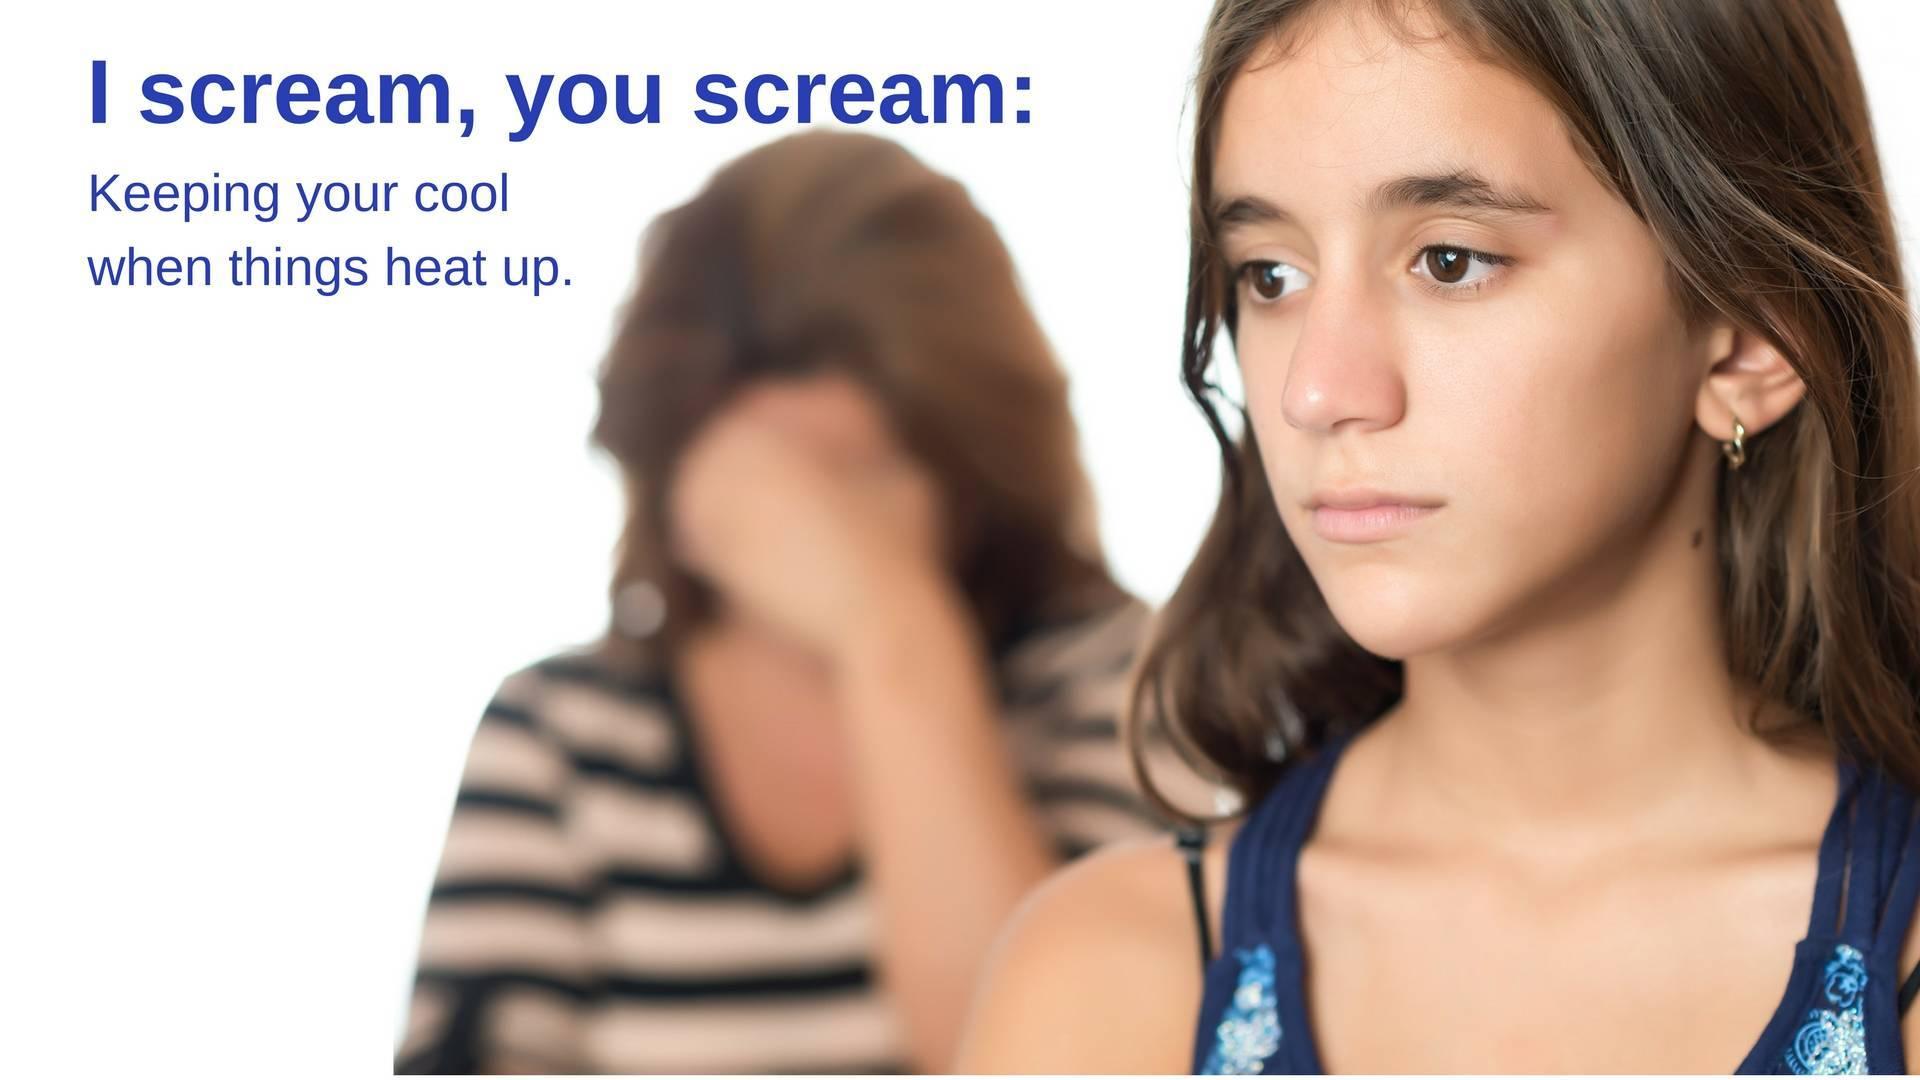 b5001a6fddd6bd7309e5_I_Scream__You_Scream__Peace_Within__9_15_16.jpg